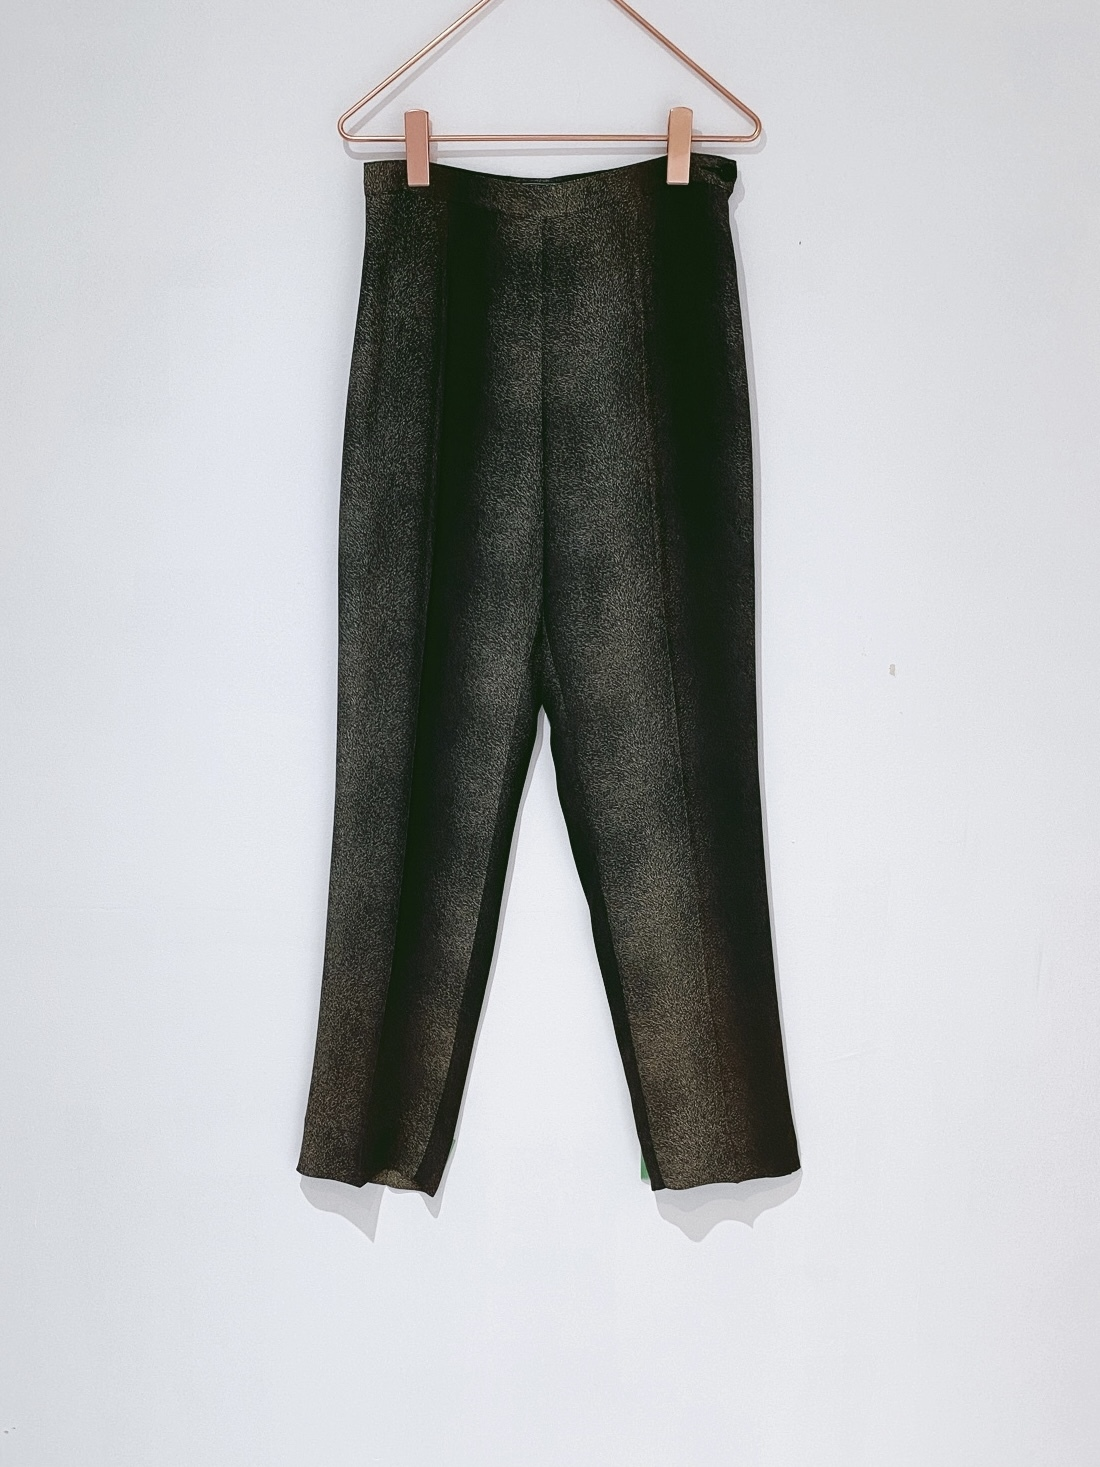 ◼︎90s Ferragamo center crease pants from Italy◼︎